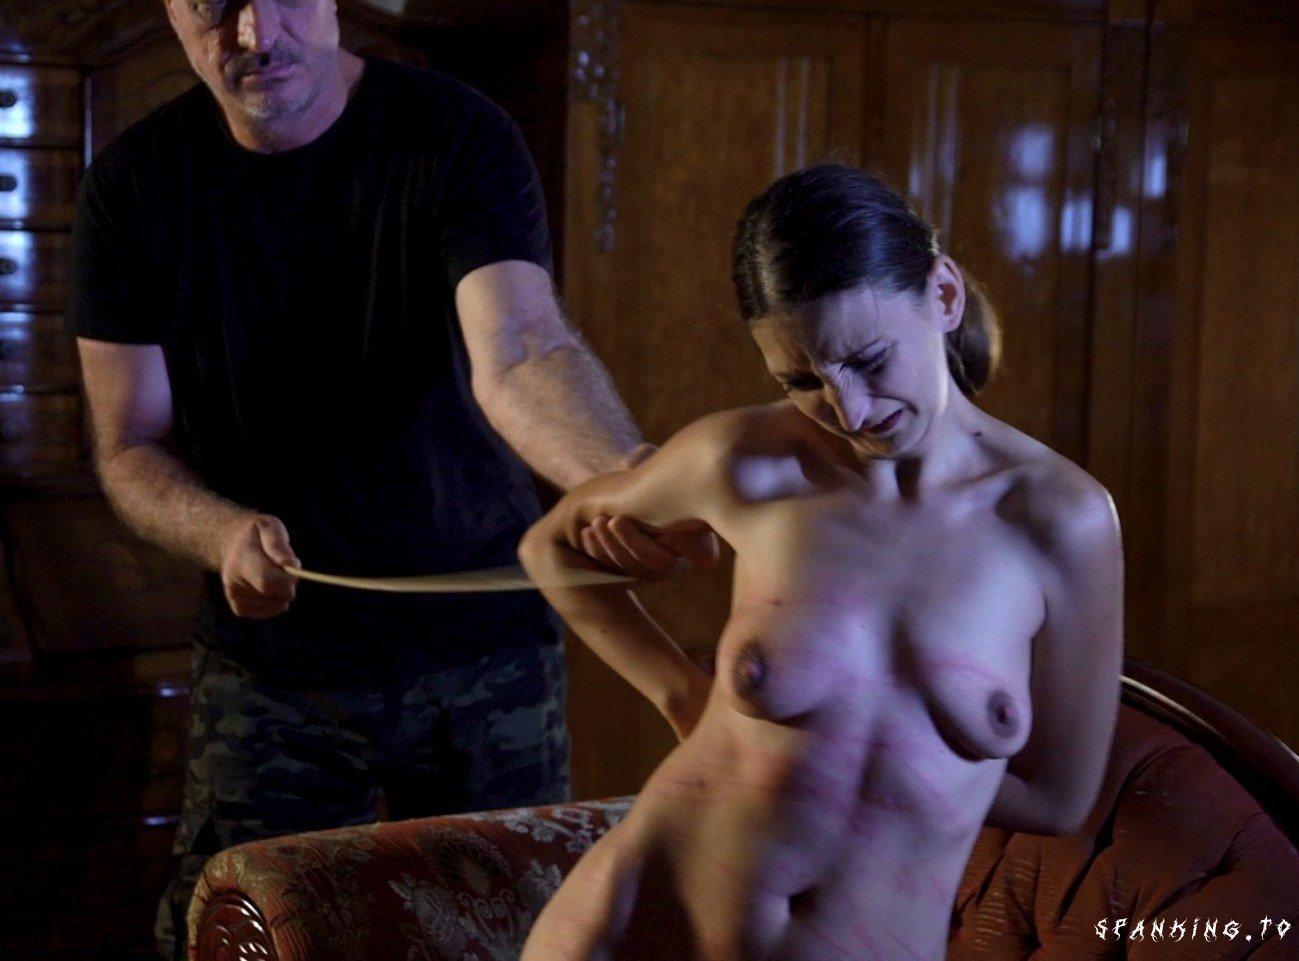 Jasmins Punishment - Getting Rid of Sins (Part 1) - Graias - Full HD